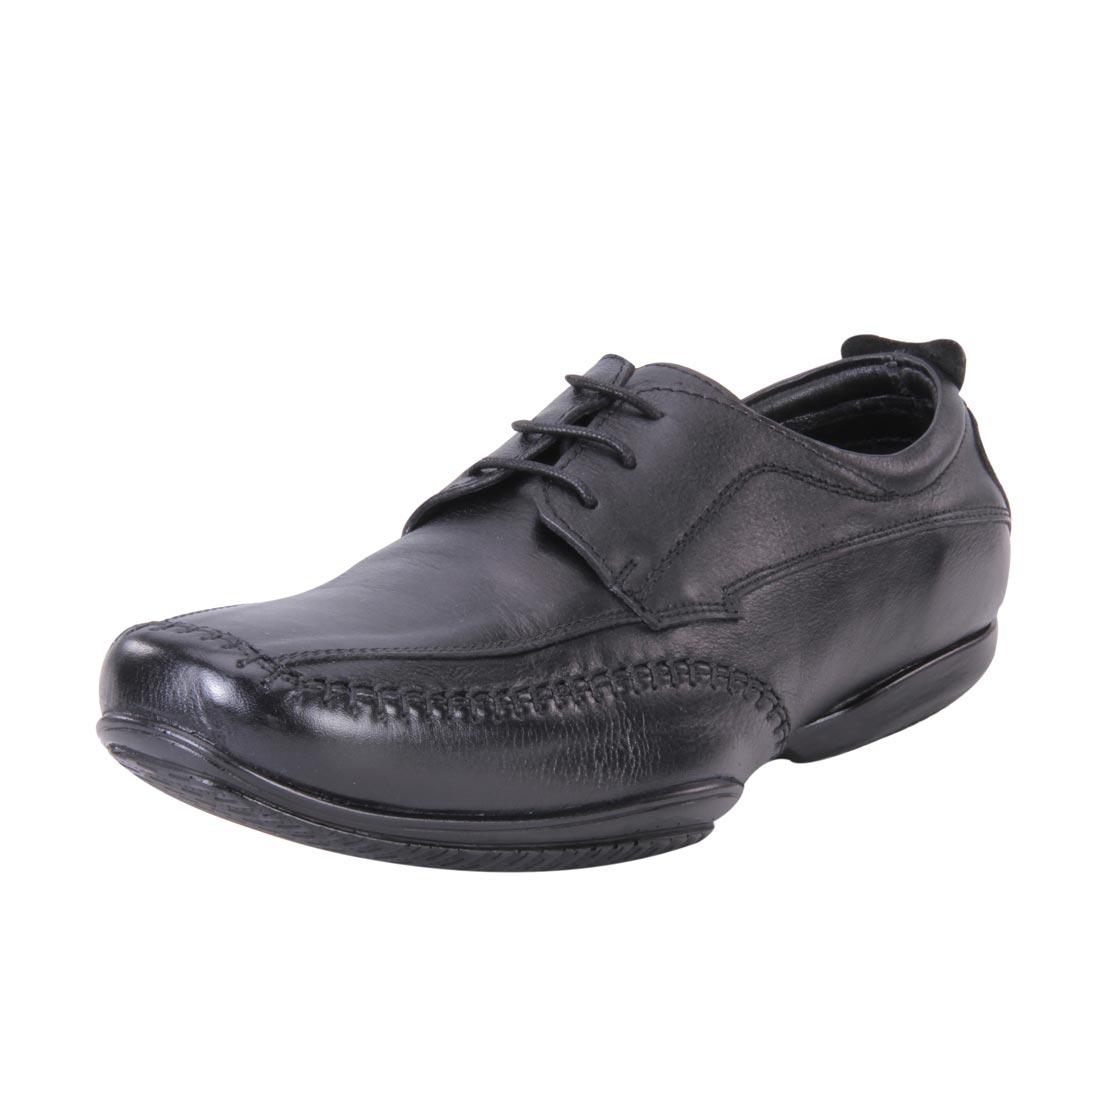 Franco Leone 9446 Black Men's Formal Shoes